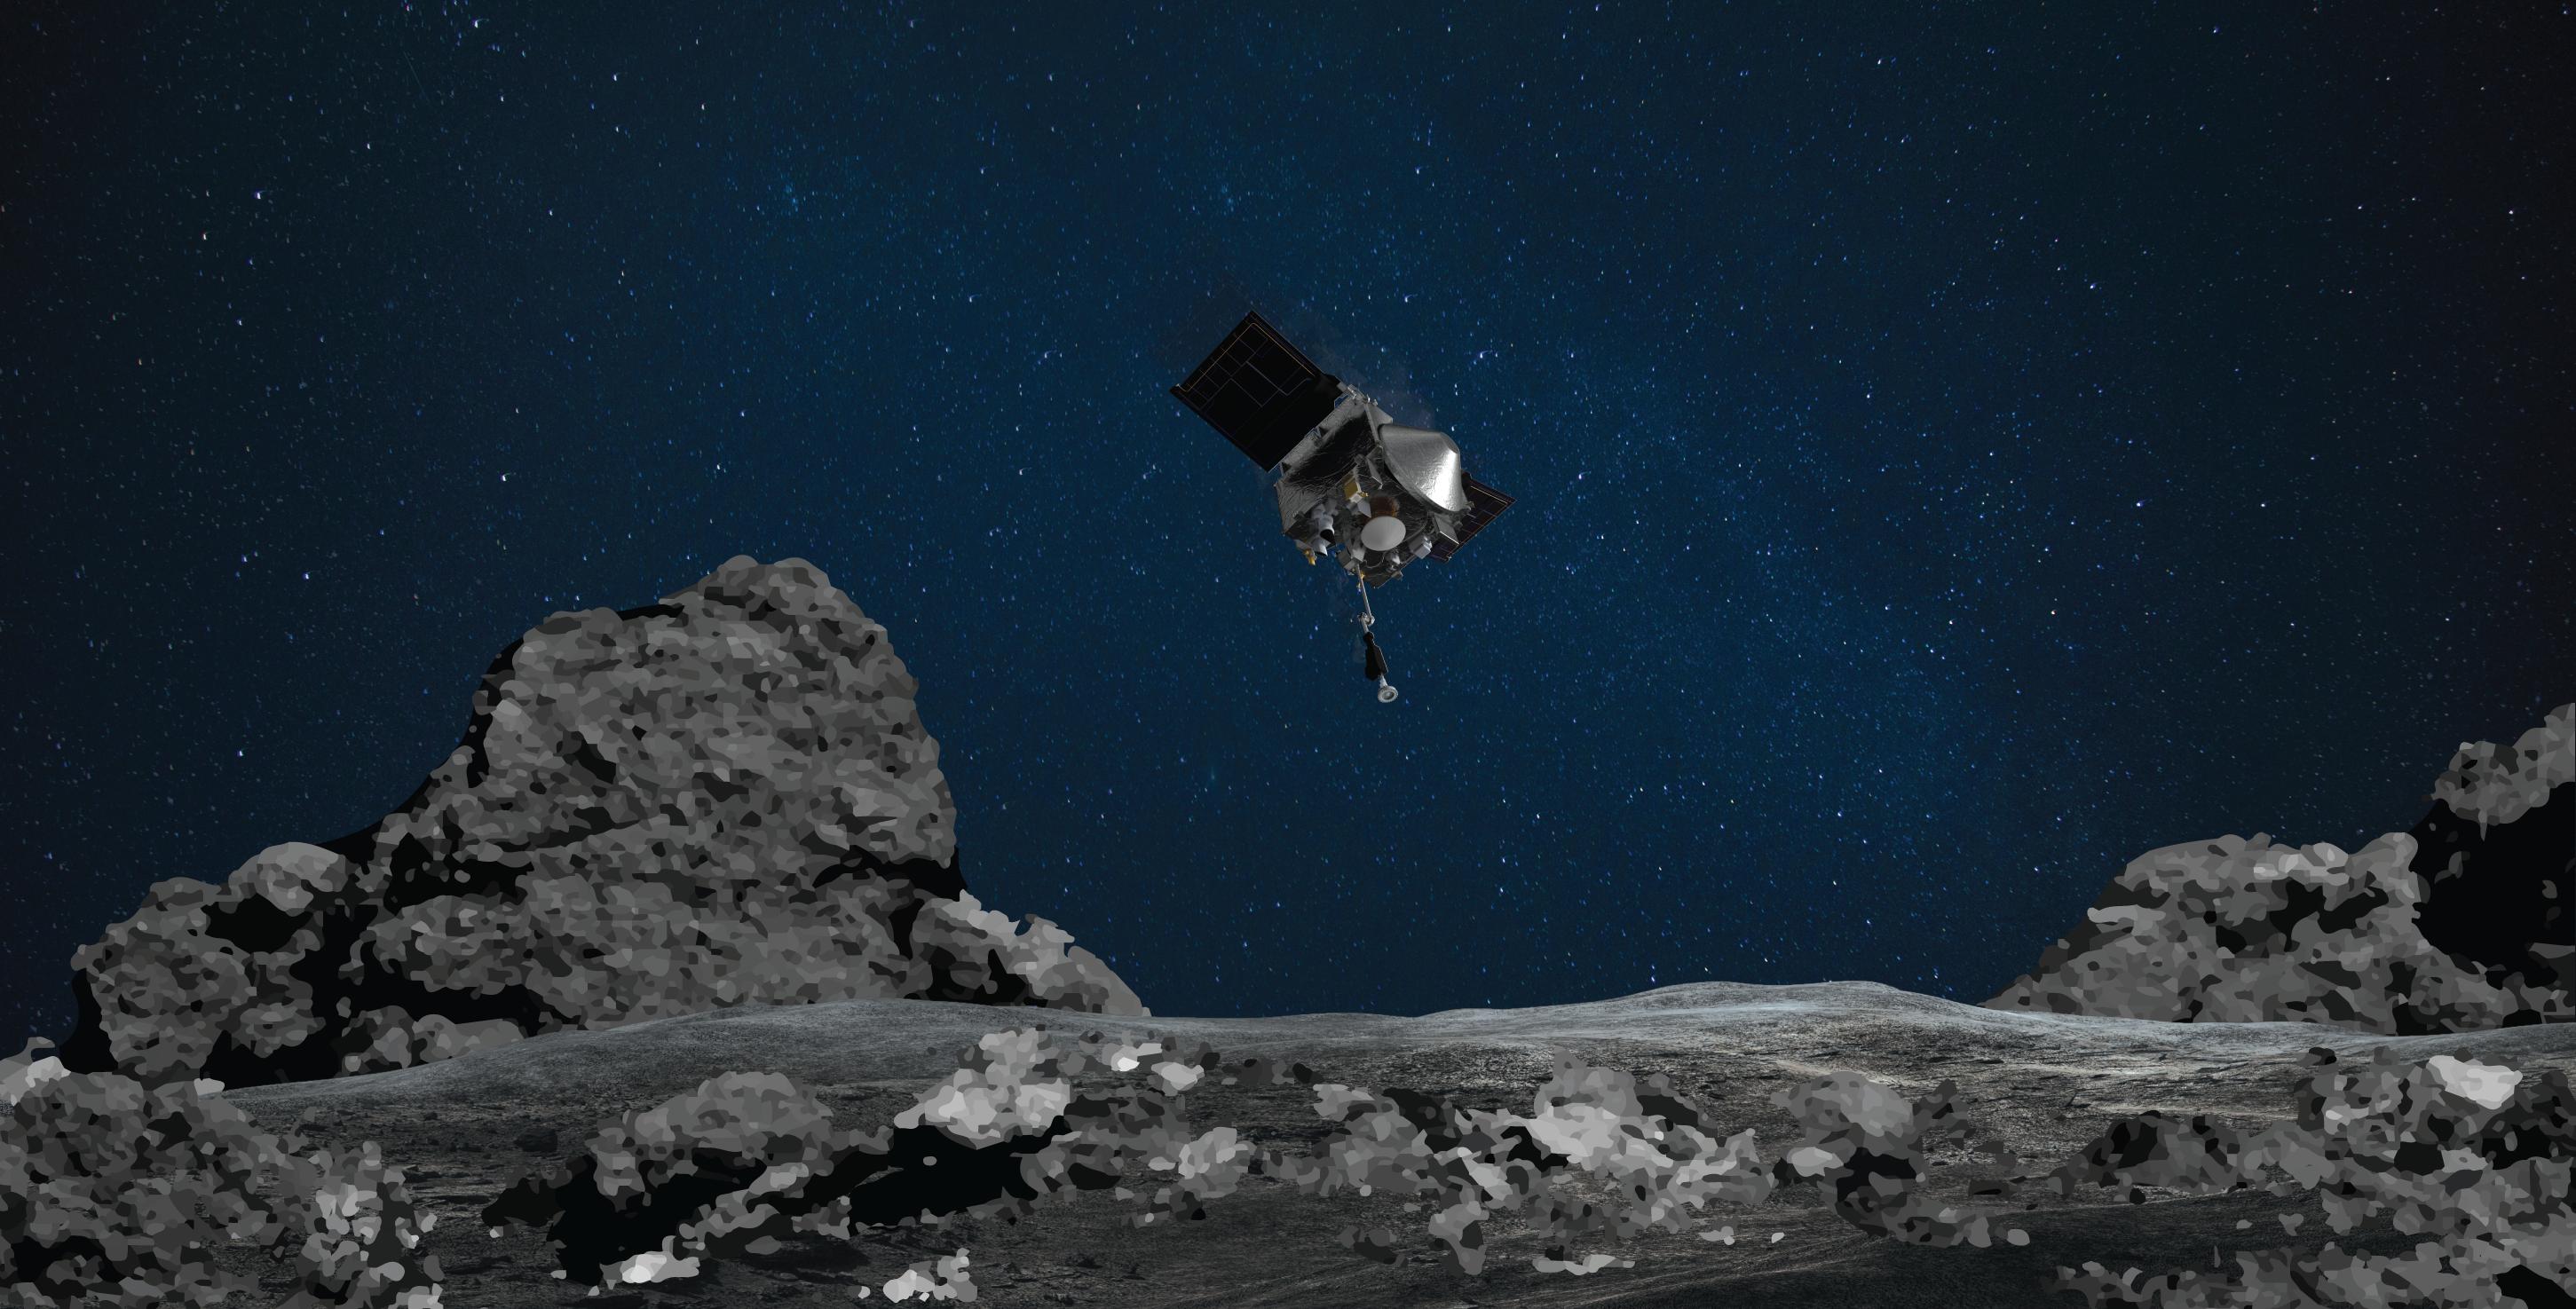 NASA's OSIRIS-REx Spacecraft Set for Sampling Attempt at Asteroid Bennu Oct. 20: Watch Live